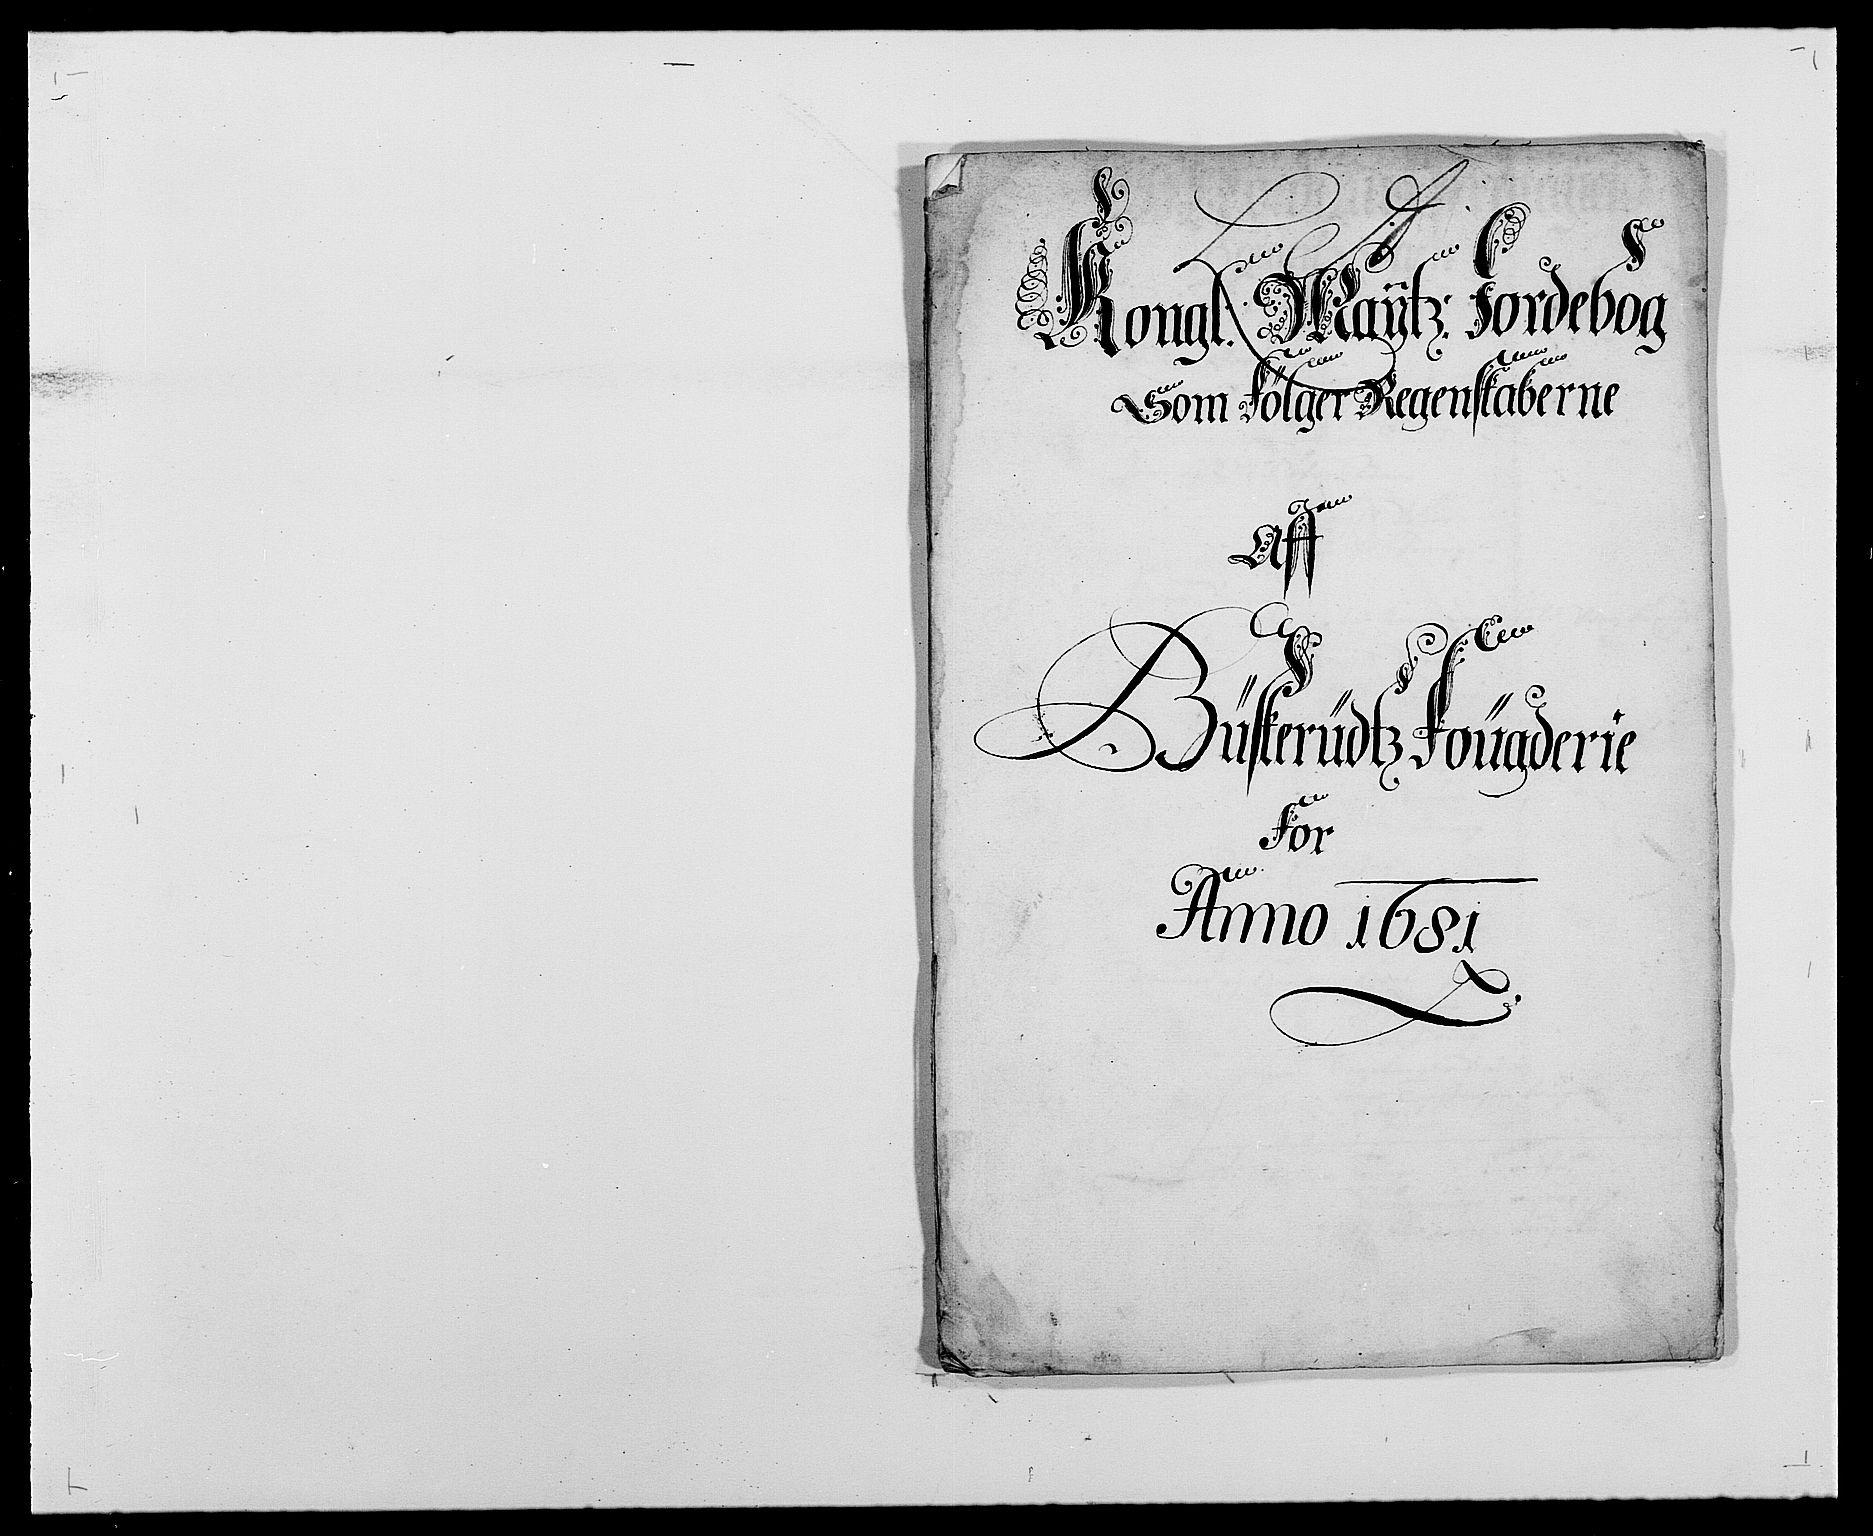 RA, Rentekammeret inntil 1814, Reviderte regnskaper, Fogderegnskap, R25/L1675: Fogderegnskap Buskerud, 1678-1681, s. 198